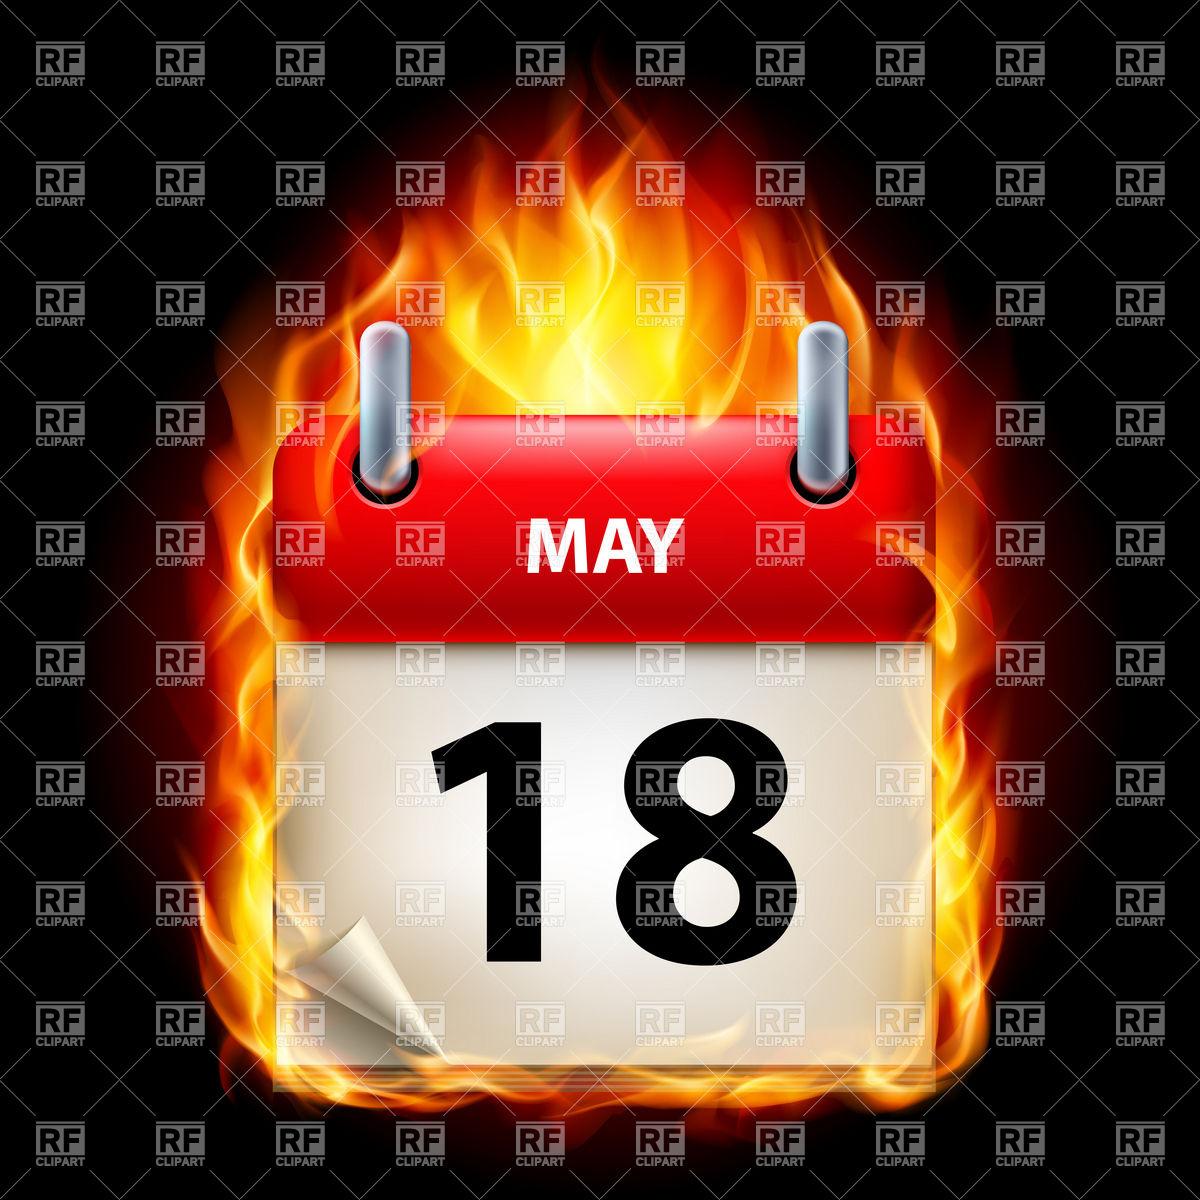 May 18th calendar clipart clip art black and white stock May 18th calendar clipart - ClipartFest clip art black and white stock